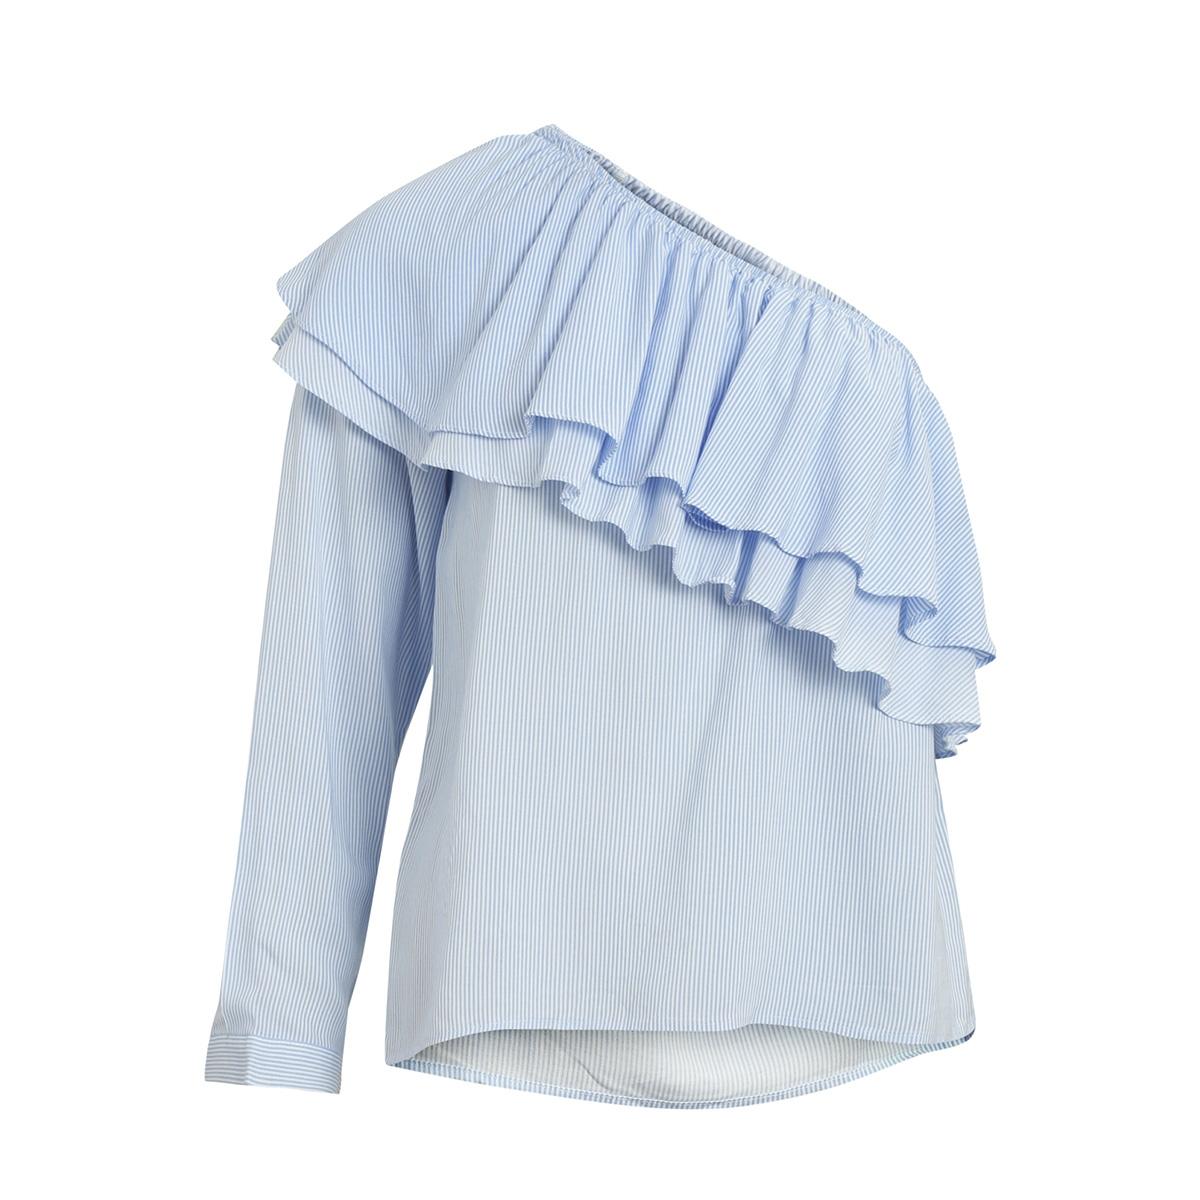 objrachel one shoulder top 96 23026531 object t-shirt gardenia